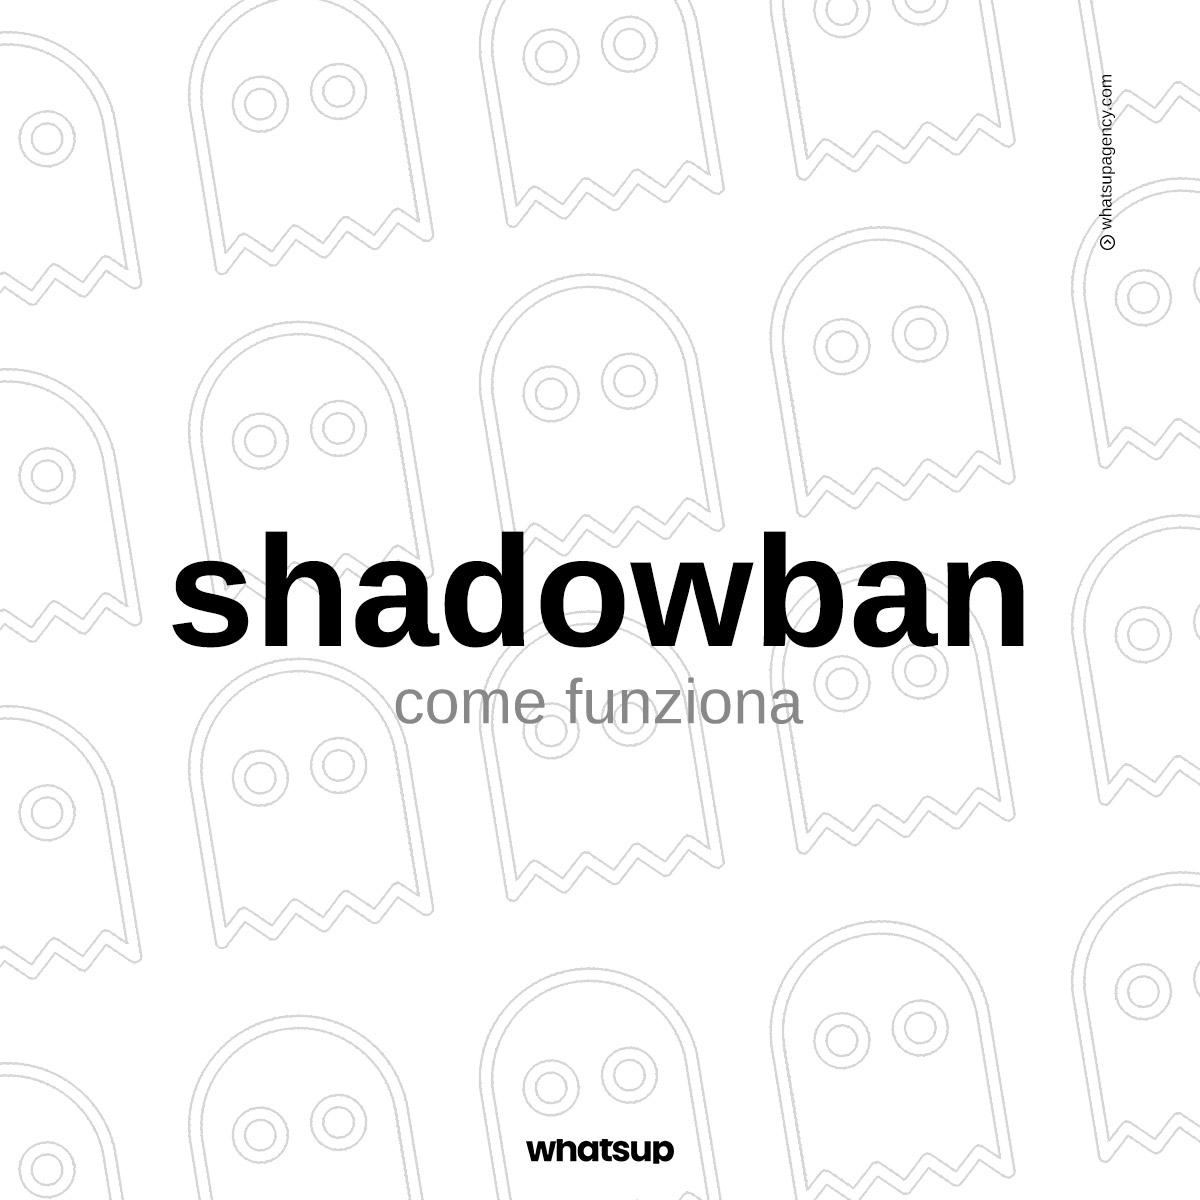 Come funziona lo shadowban?